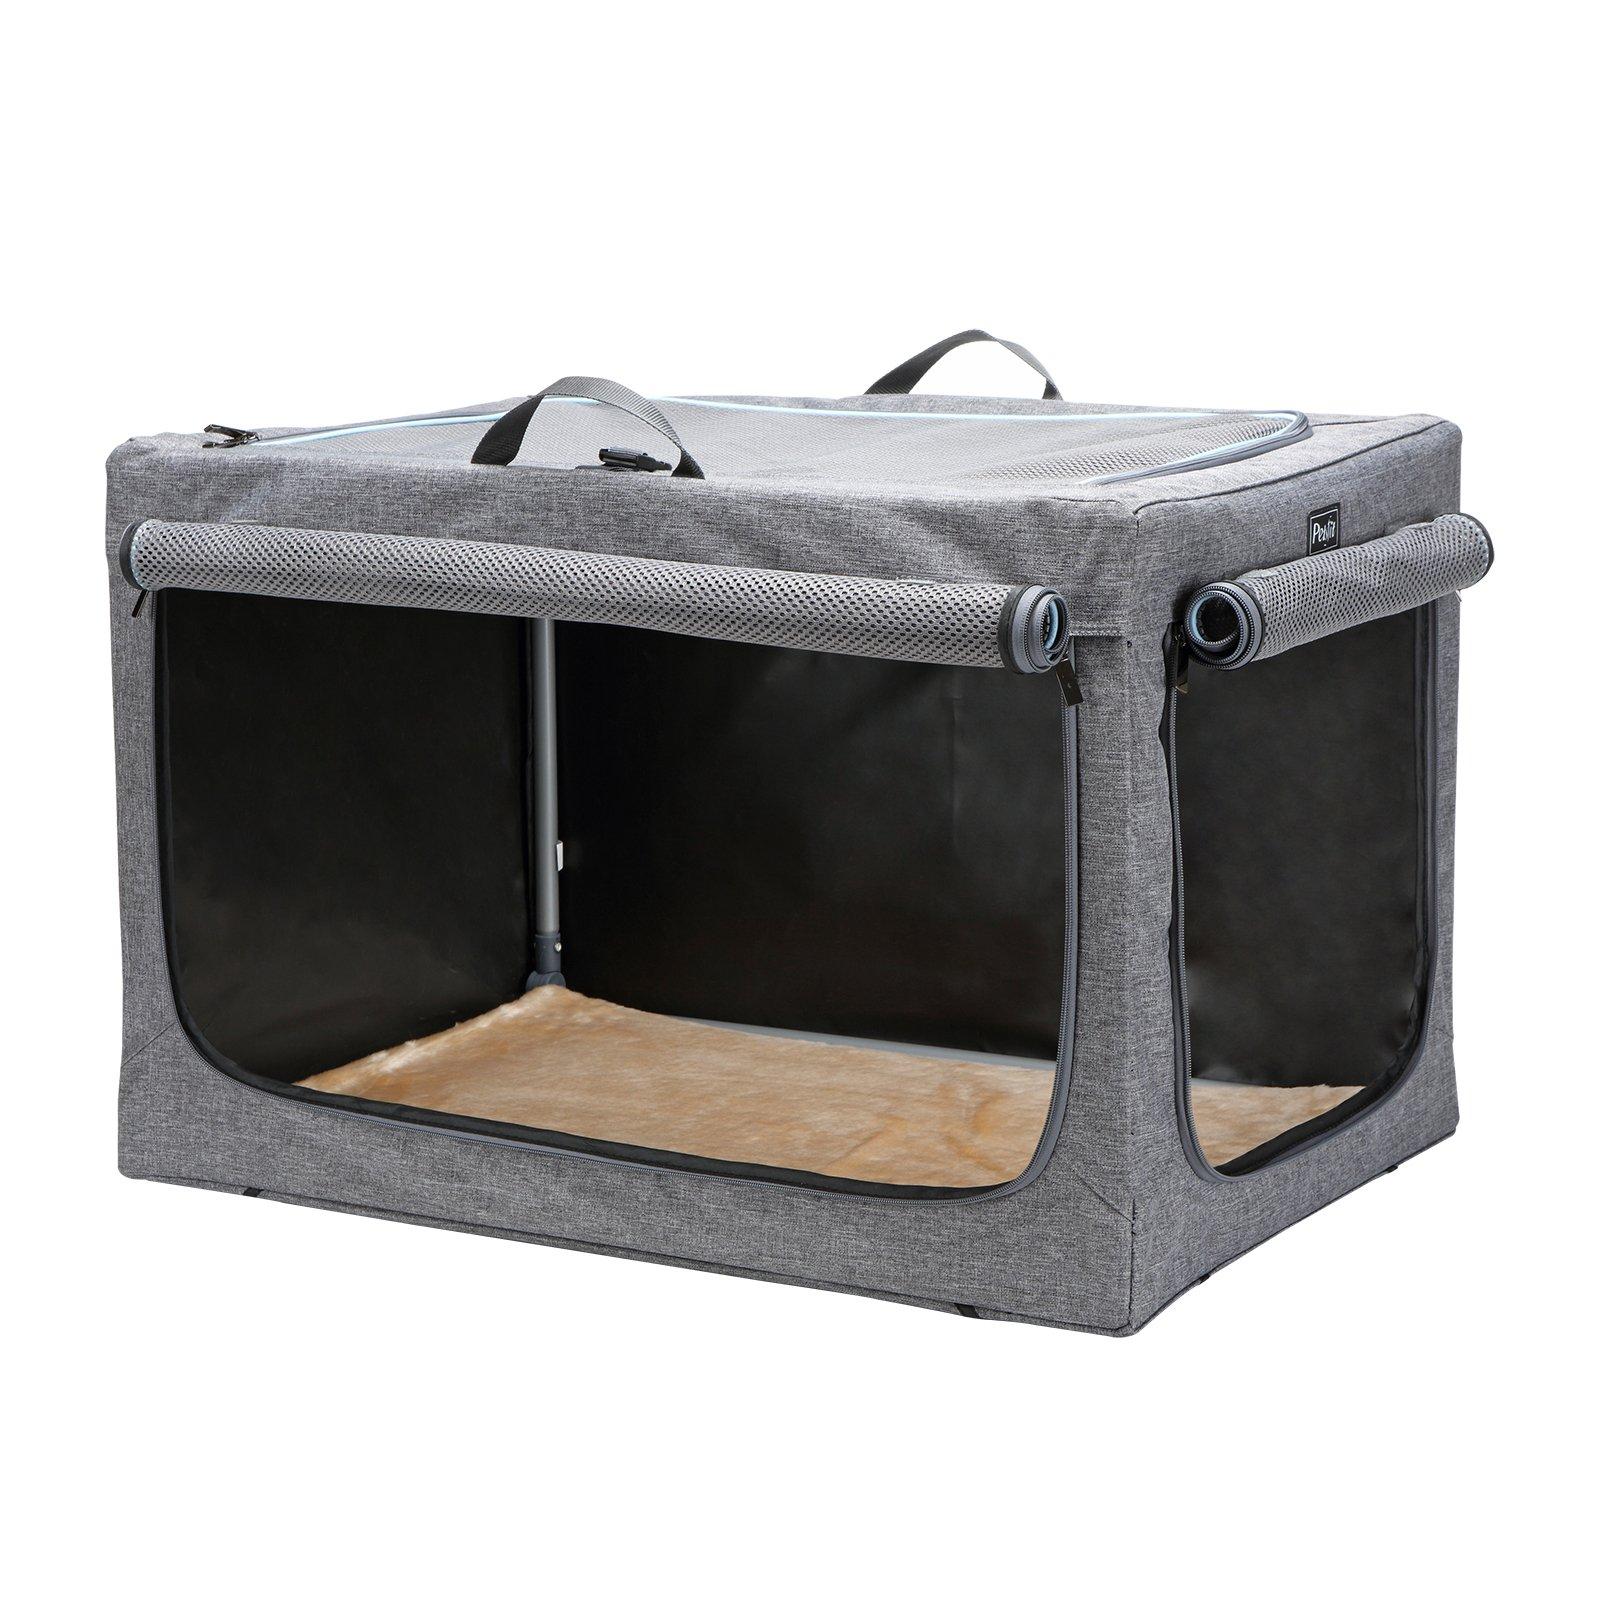 Petsfit Portable Soft Large Dog Crate Travle Dog Crate for Medium to Large Dog Soft Sided Pet Crate Grey 36'' LX 24'' WX 23'' H